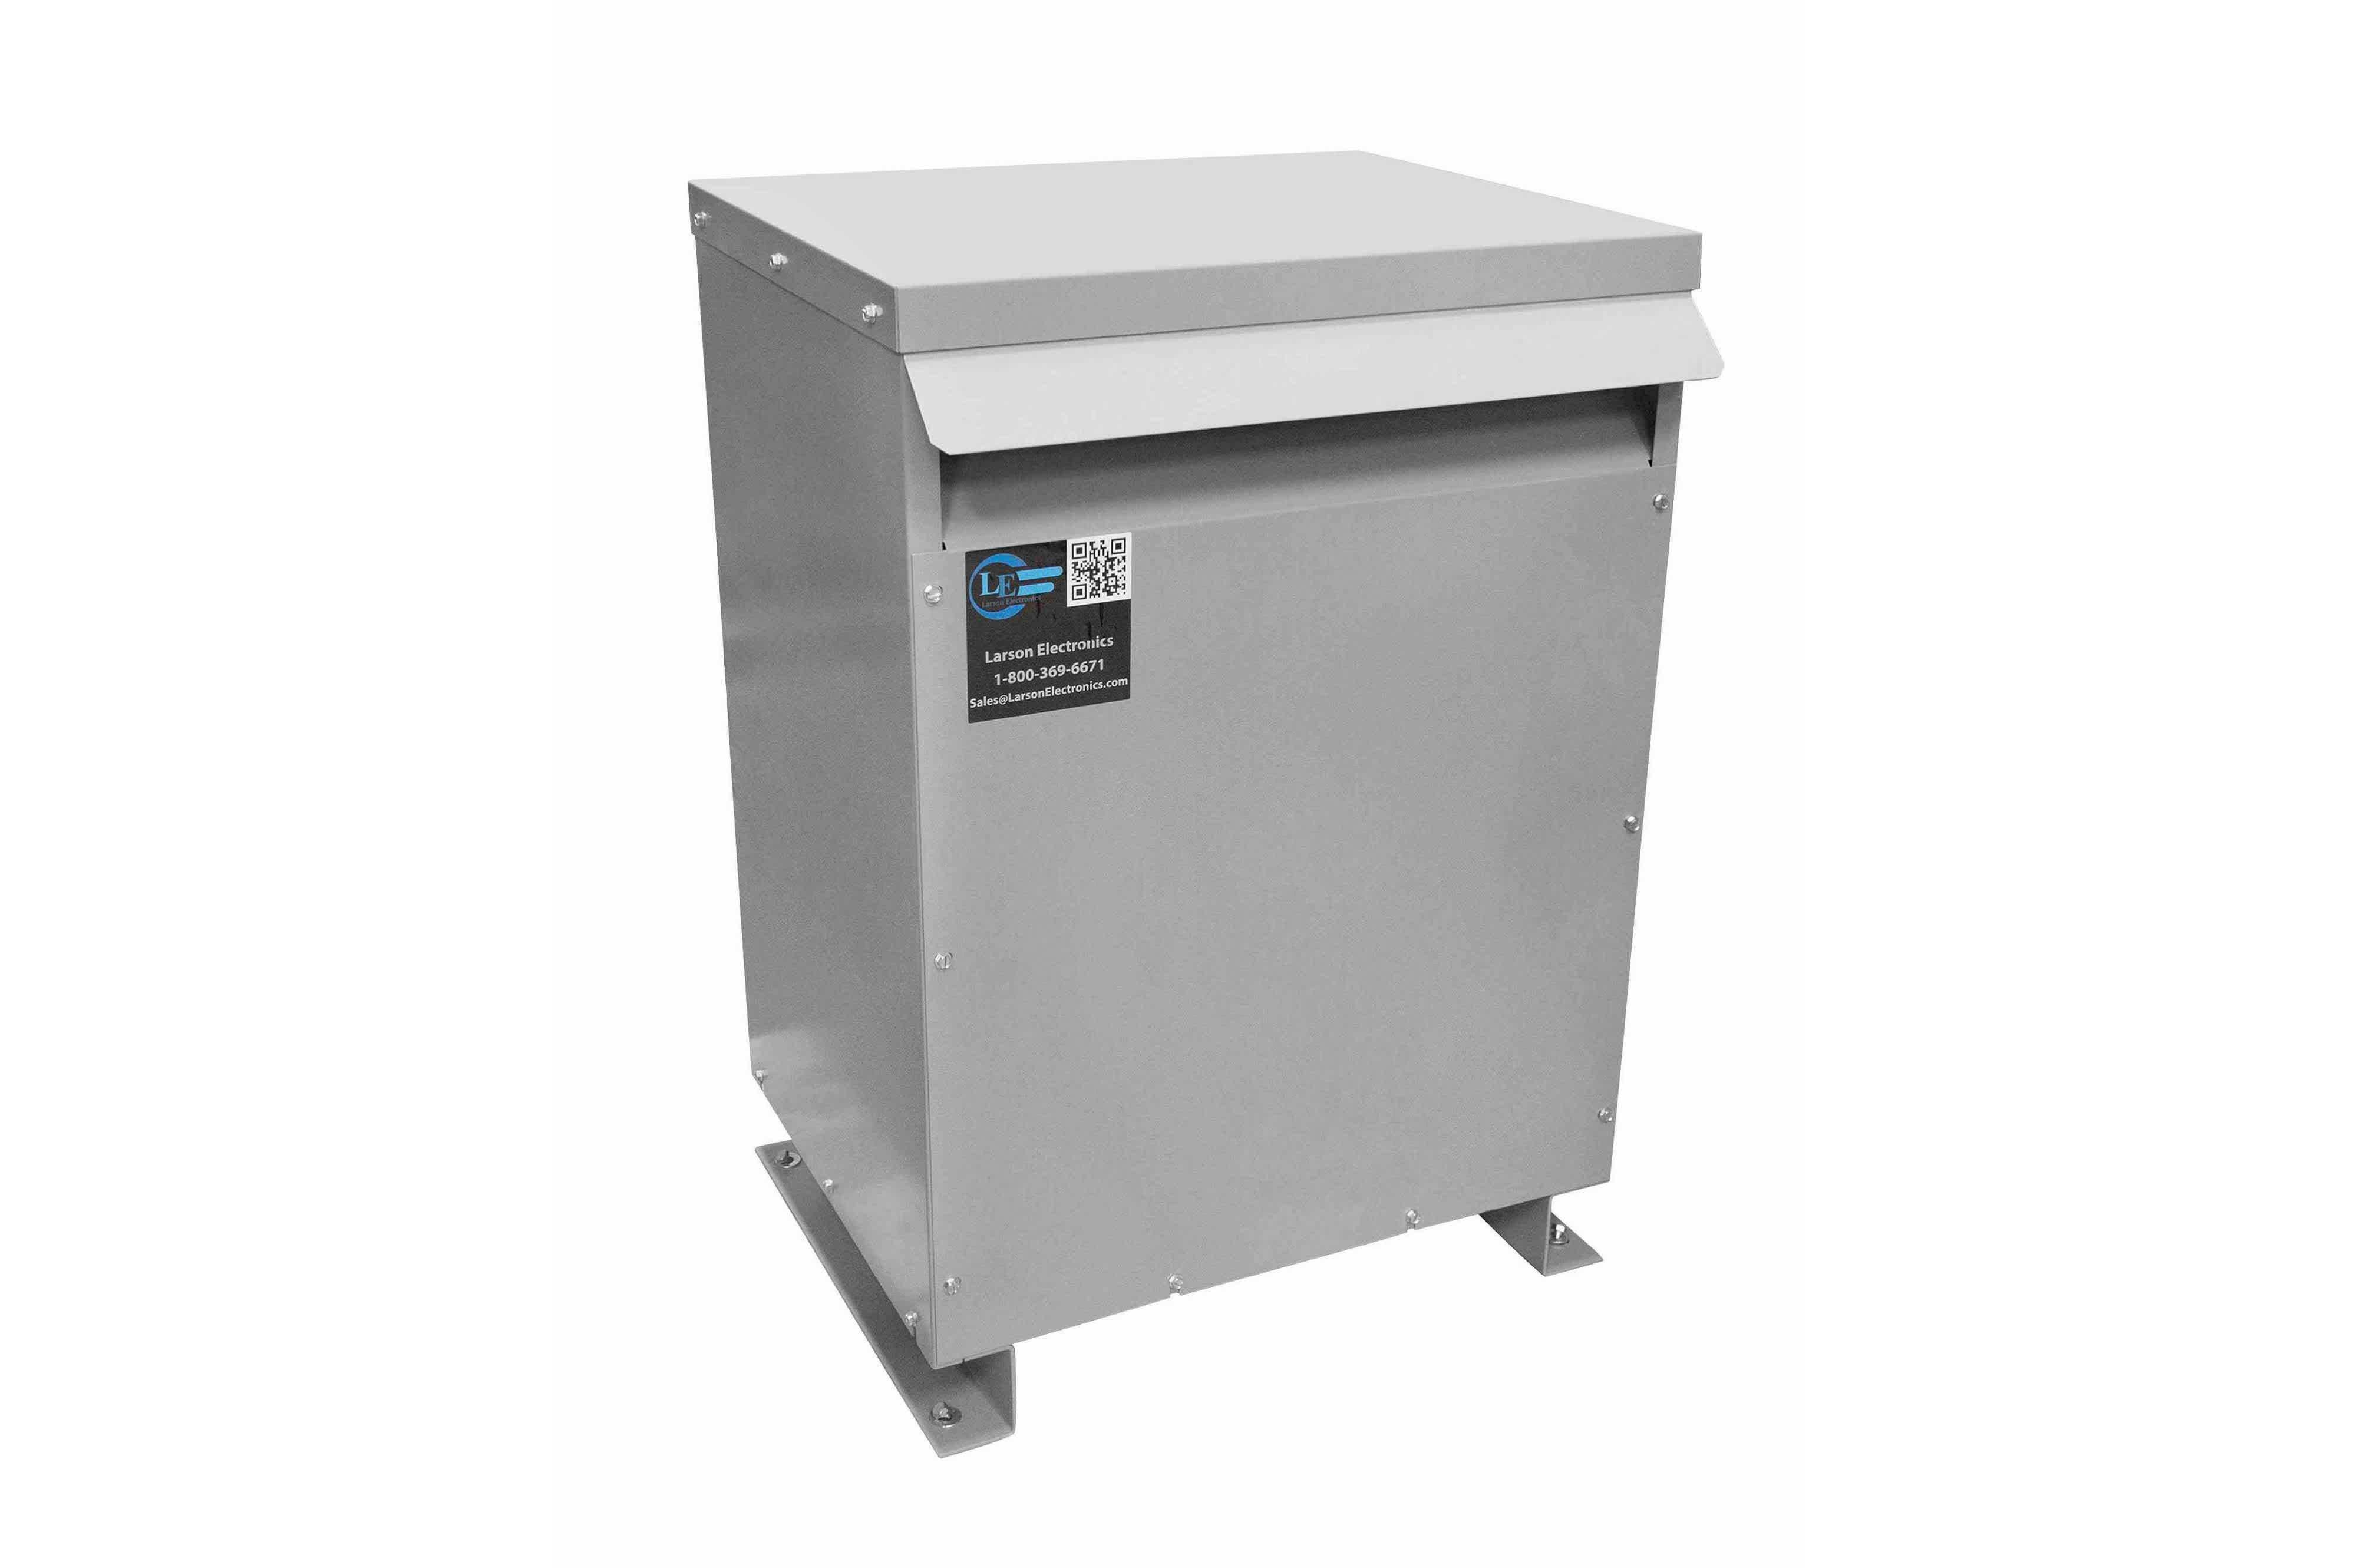 25 kVA 3PH Isolation Transformer, 400V Wye Primary, 480Y/277 Wye-N Secondary, N3R, Ventilated, 60 Hz